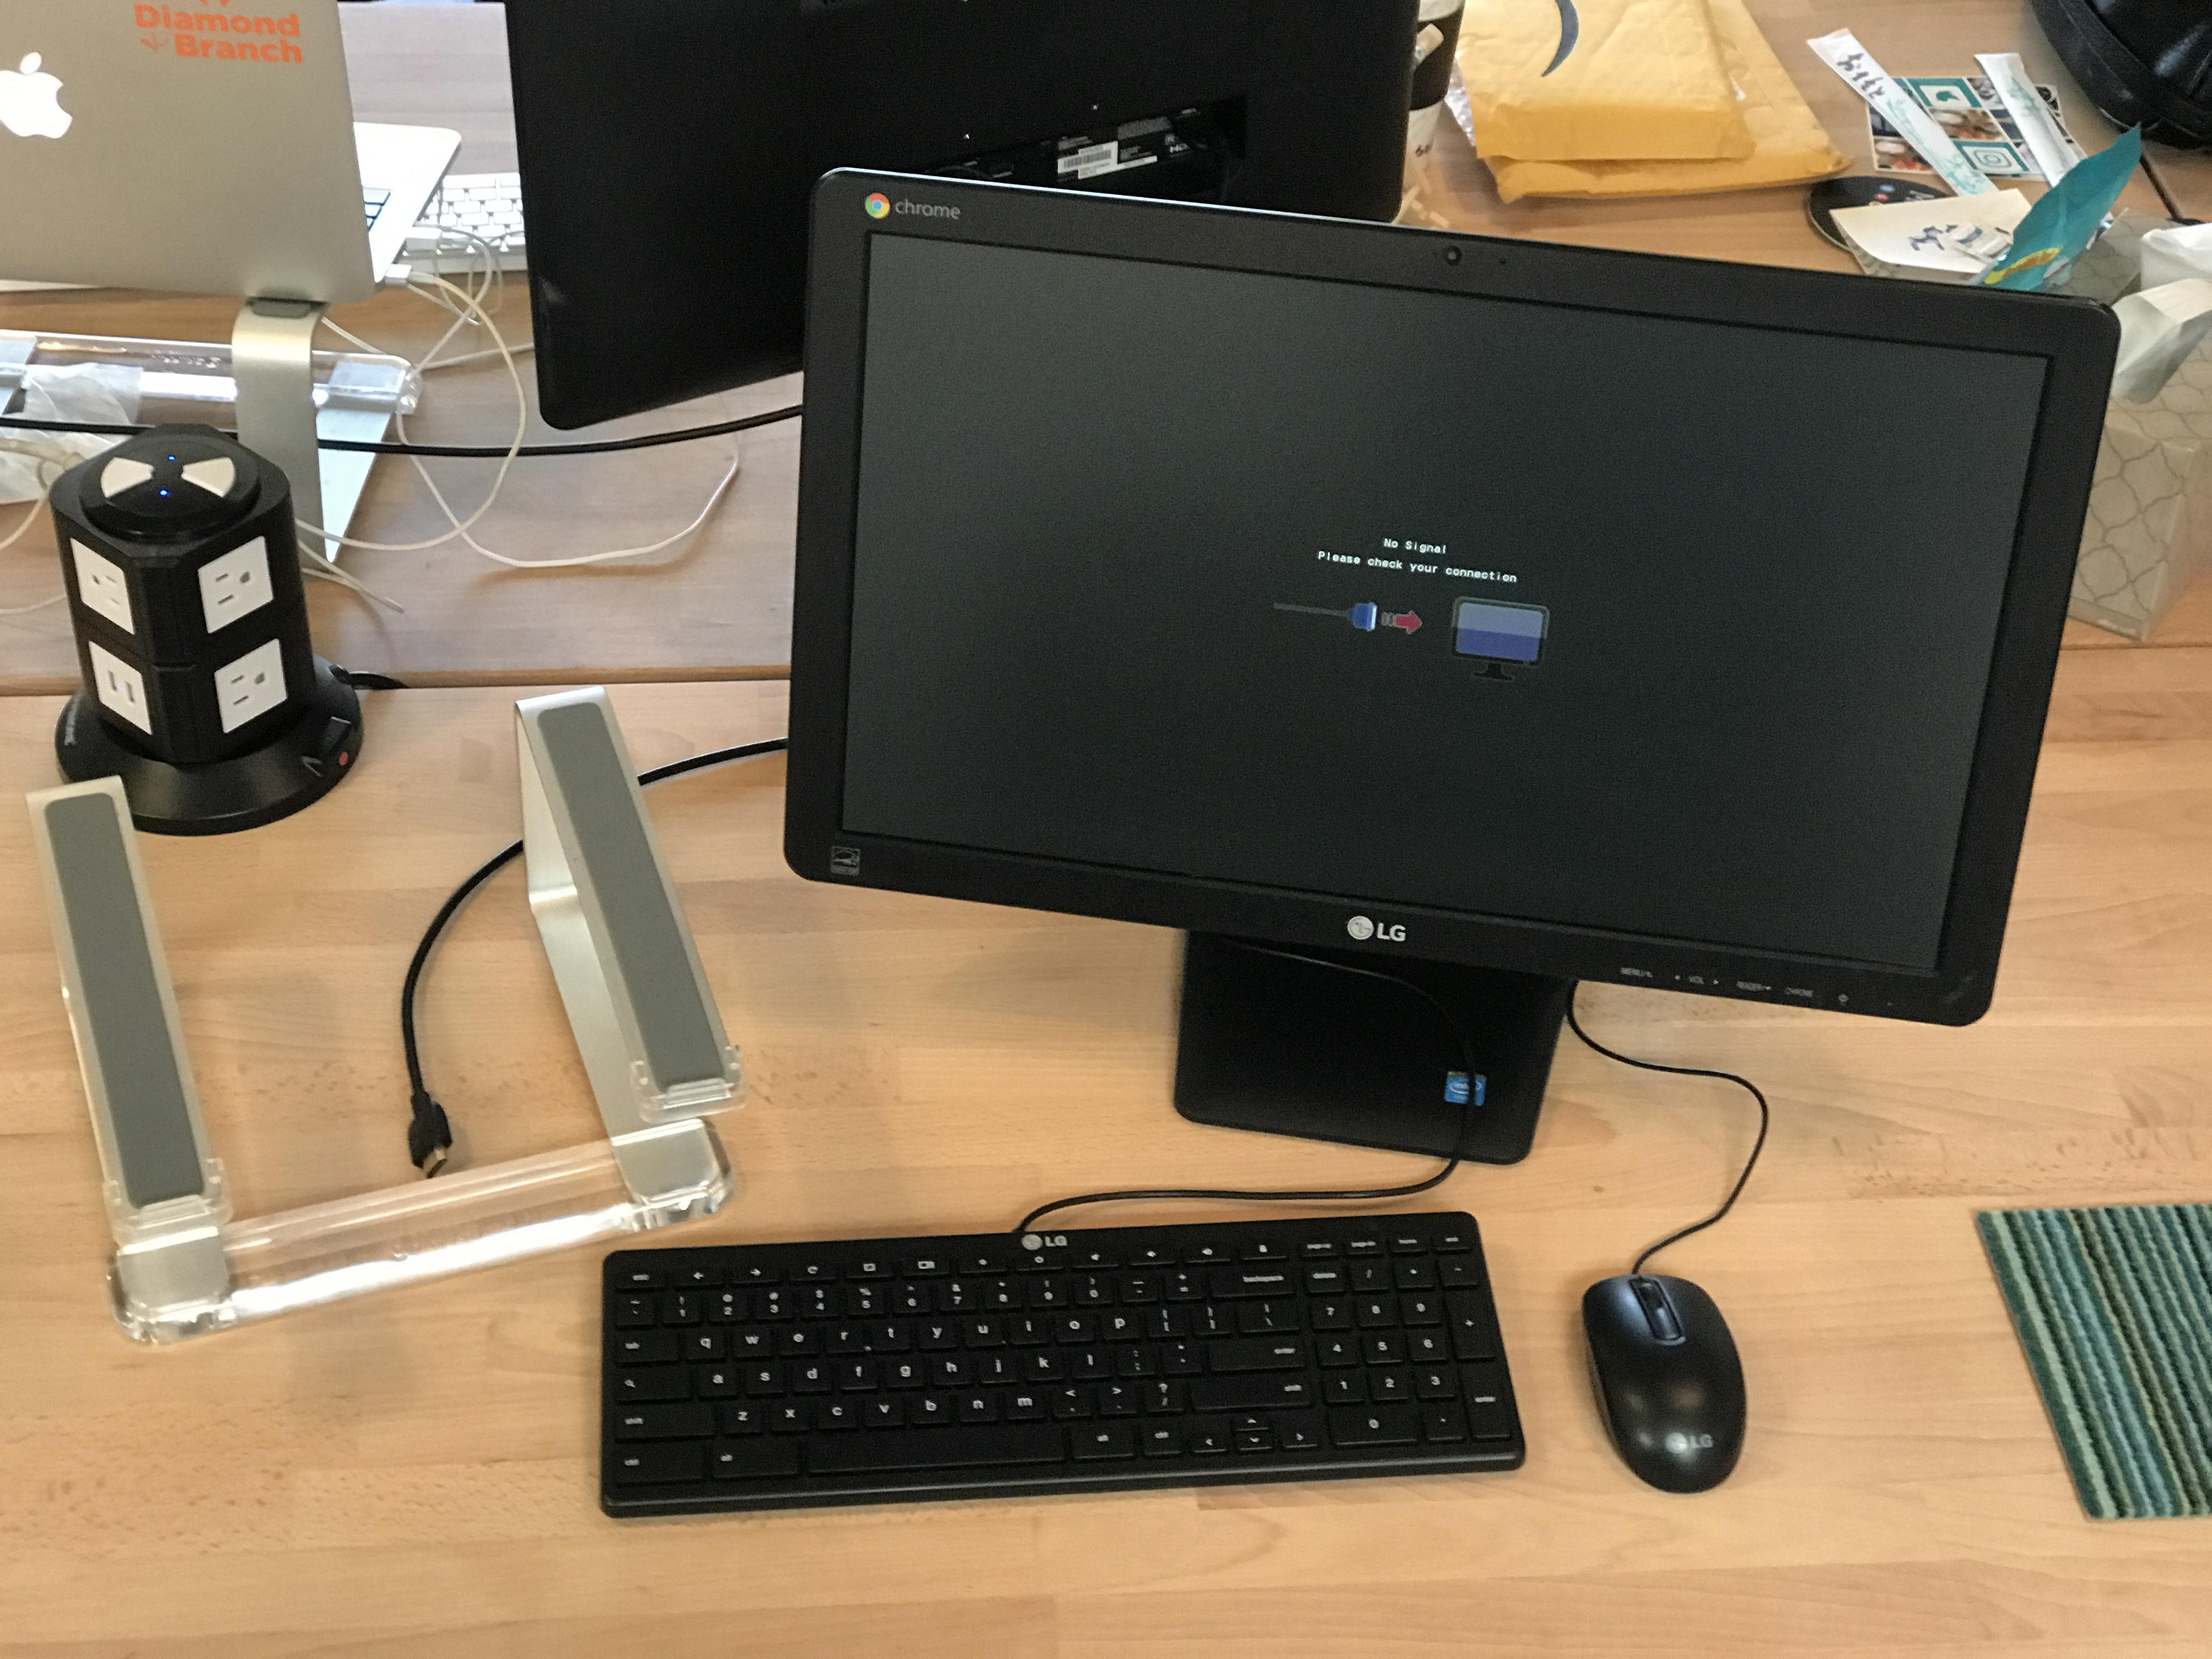 Diamond + Branch Marketing Group - Desk + LG Chrome Monitor